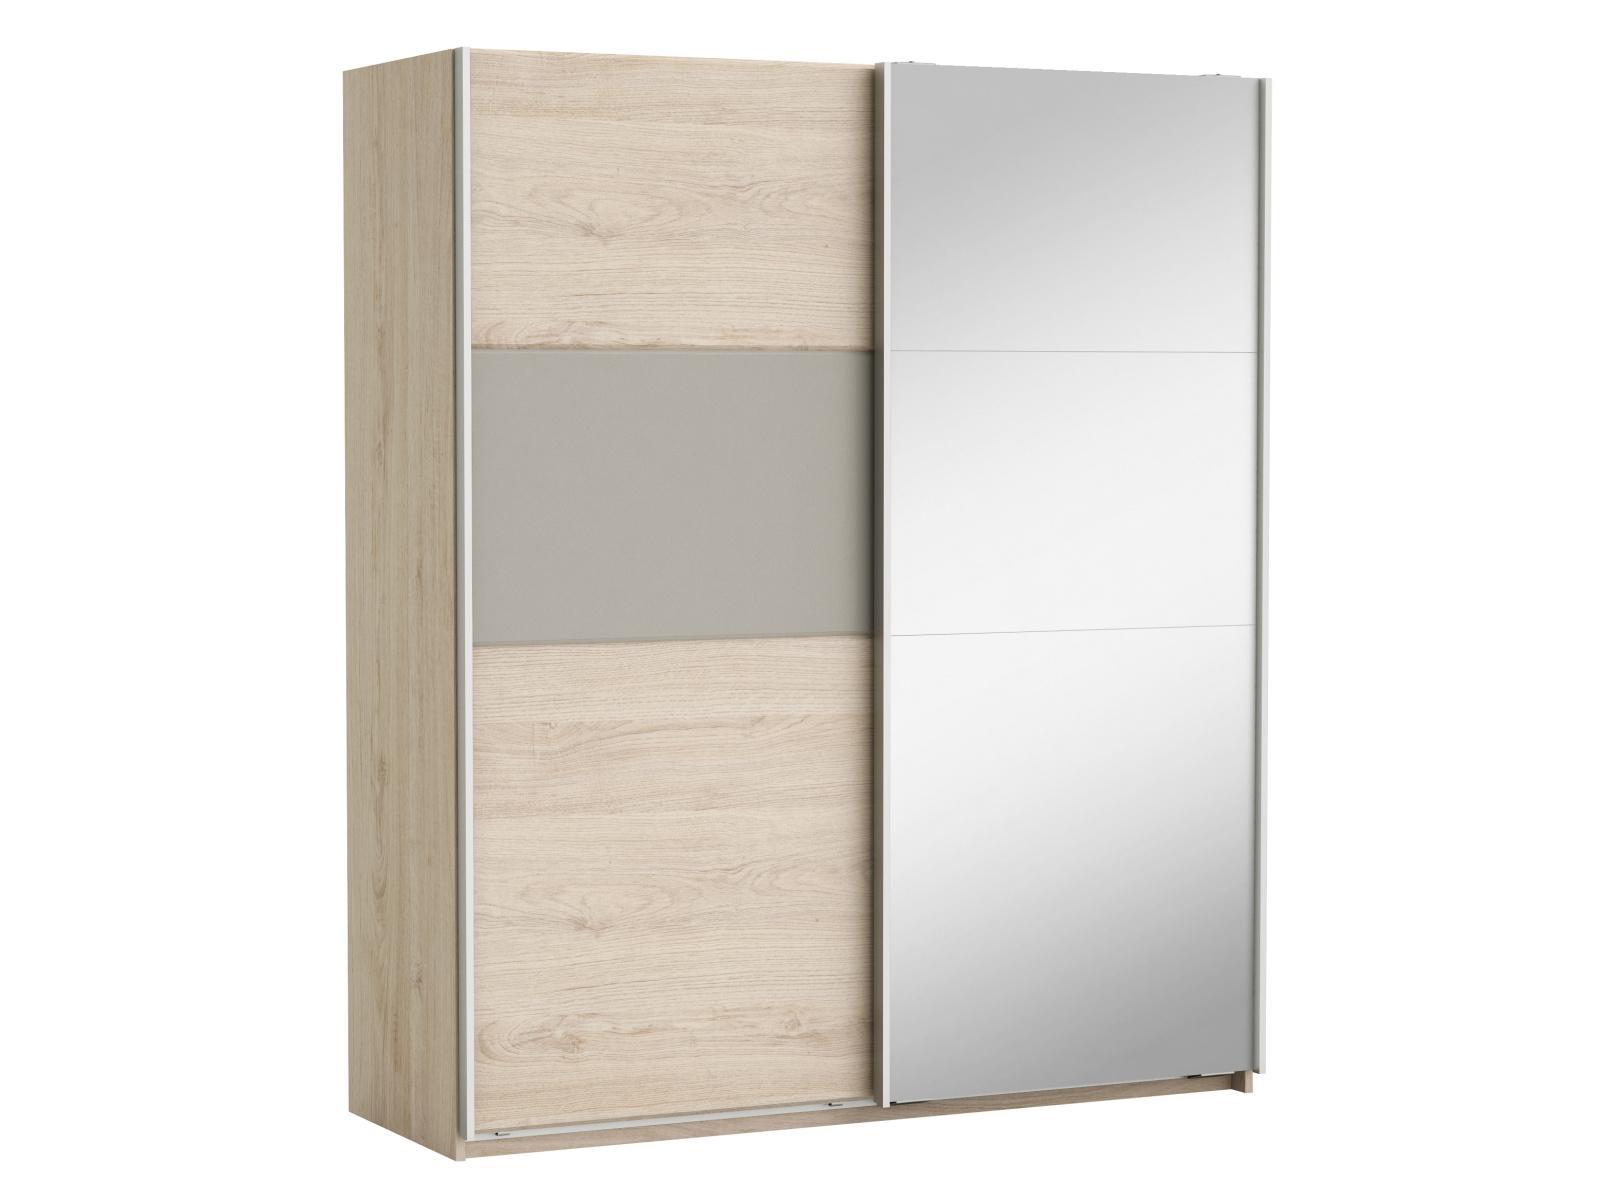 DEMEYERE GIORGIA šatní skříň se zrcadlem 2S, dub arizona/jíl